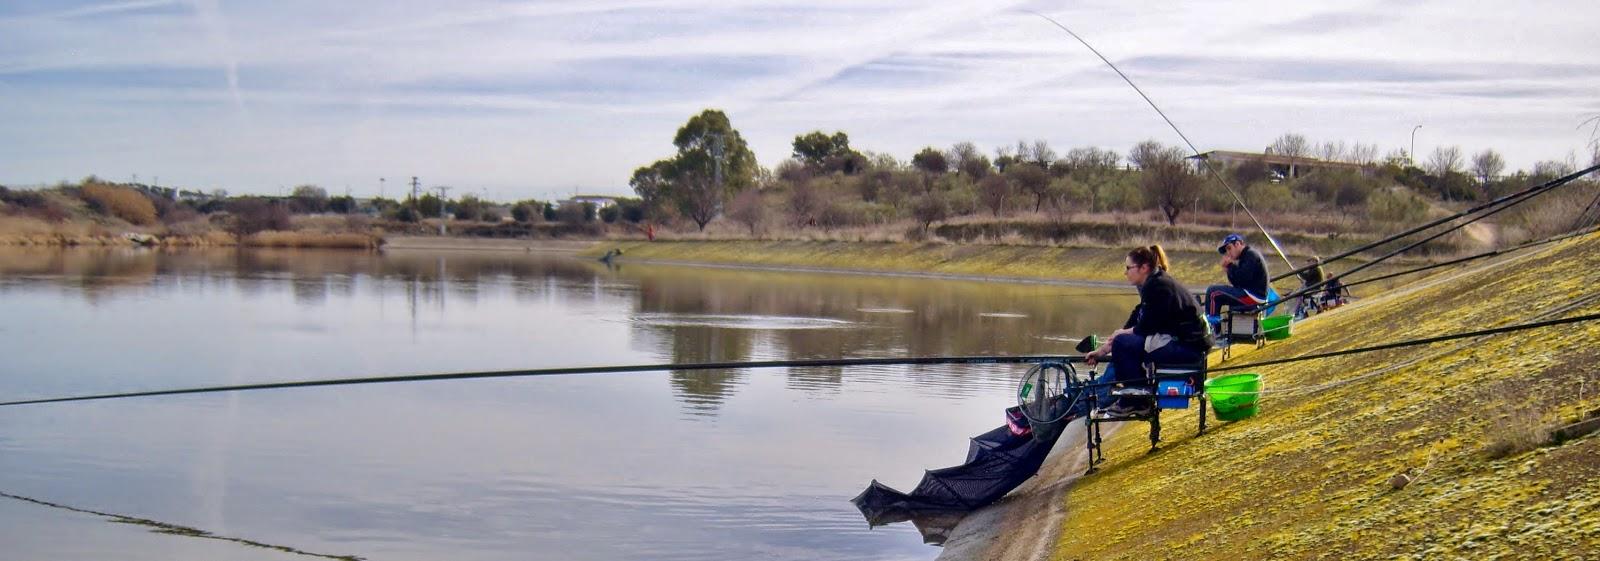 http://albun-de-fotos.blogspot.com.es/2014_02_09_archive.html